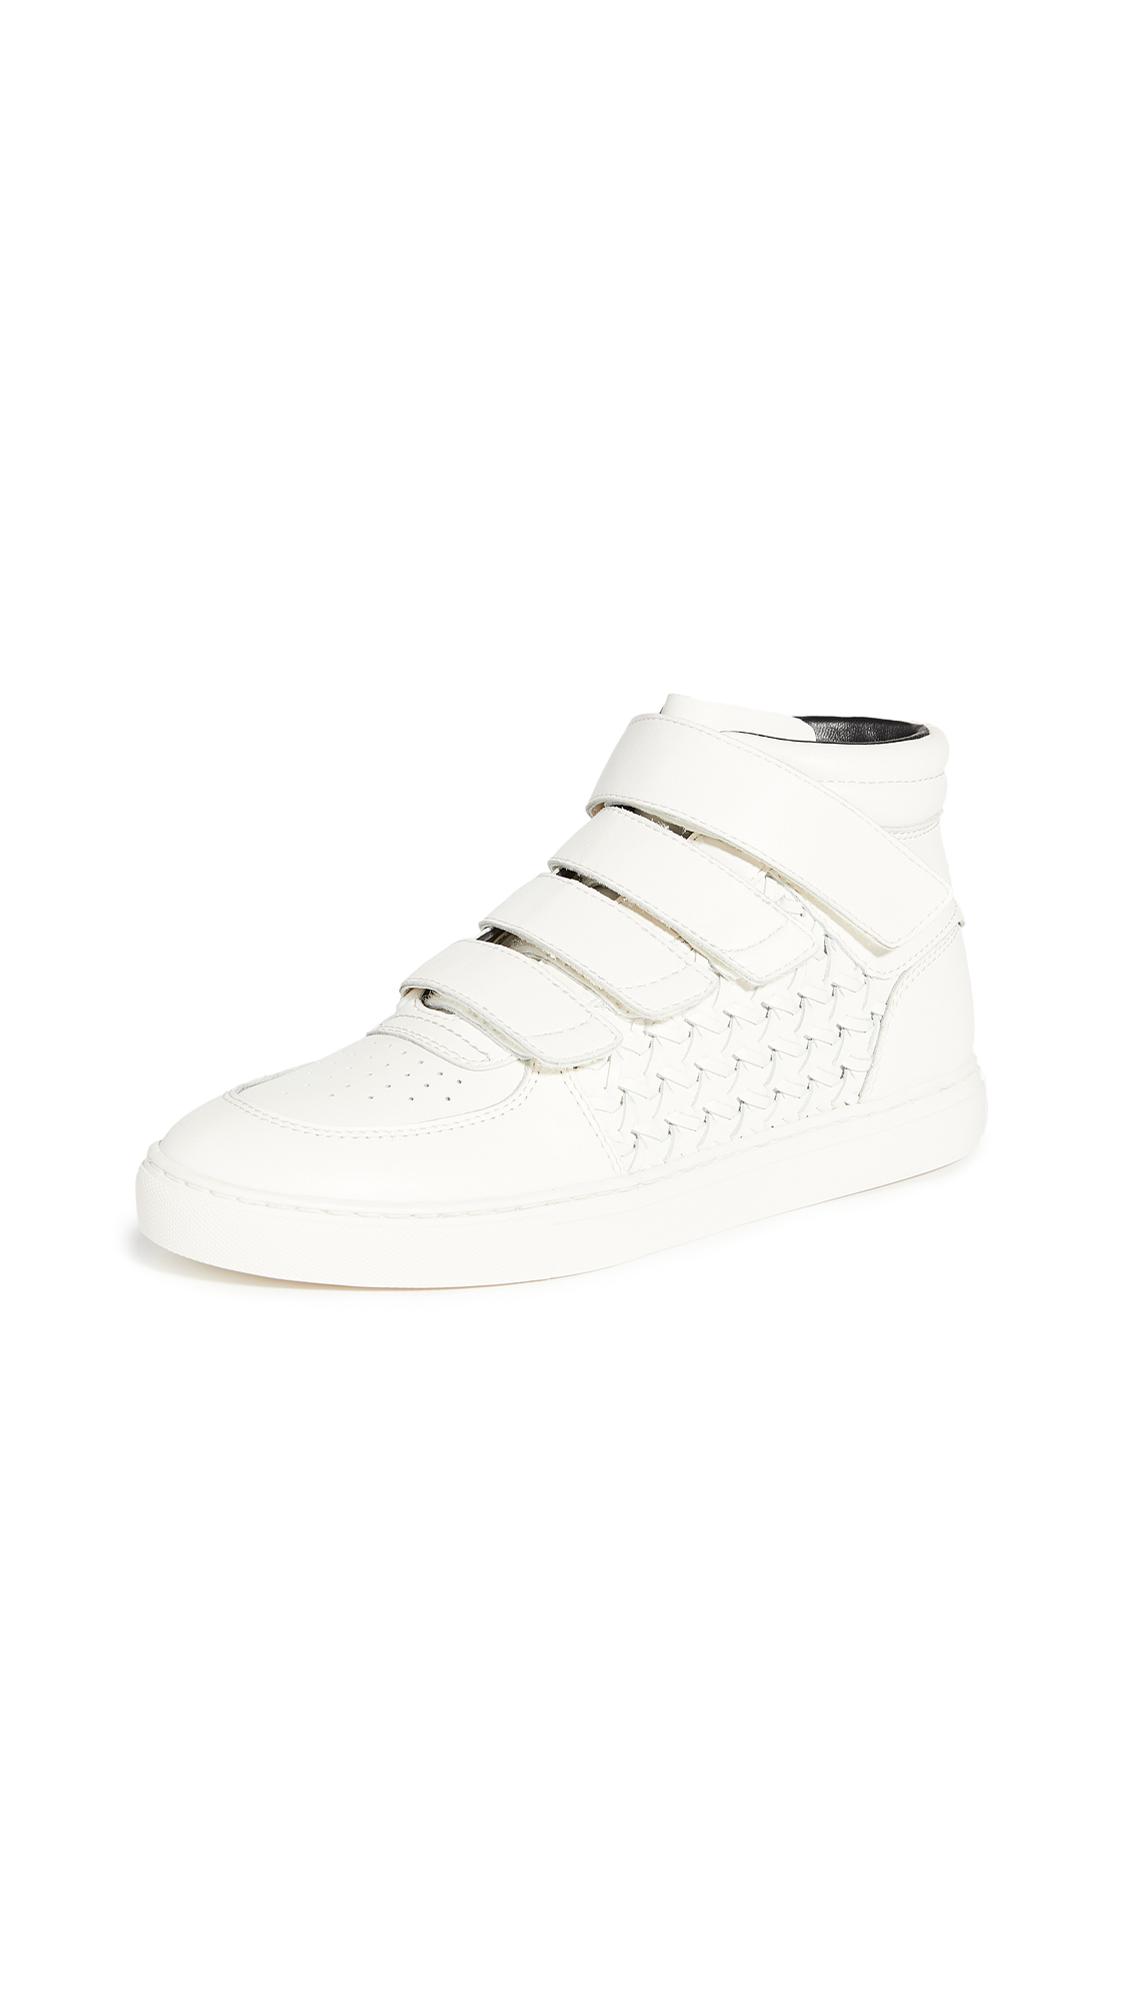 Zimmermann High Top Velcro Strap Sneakers - 50% Off Sale